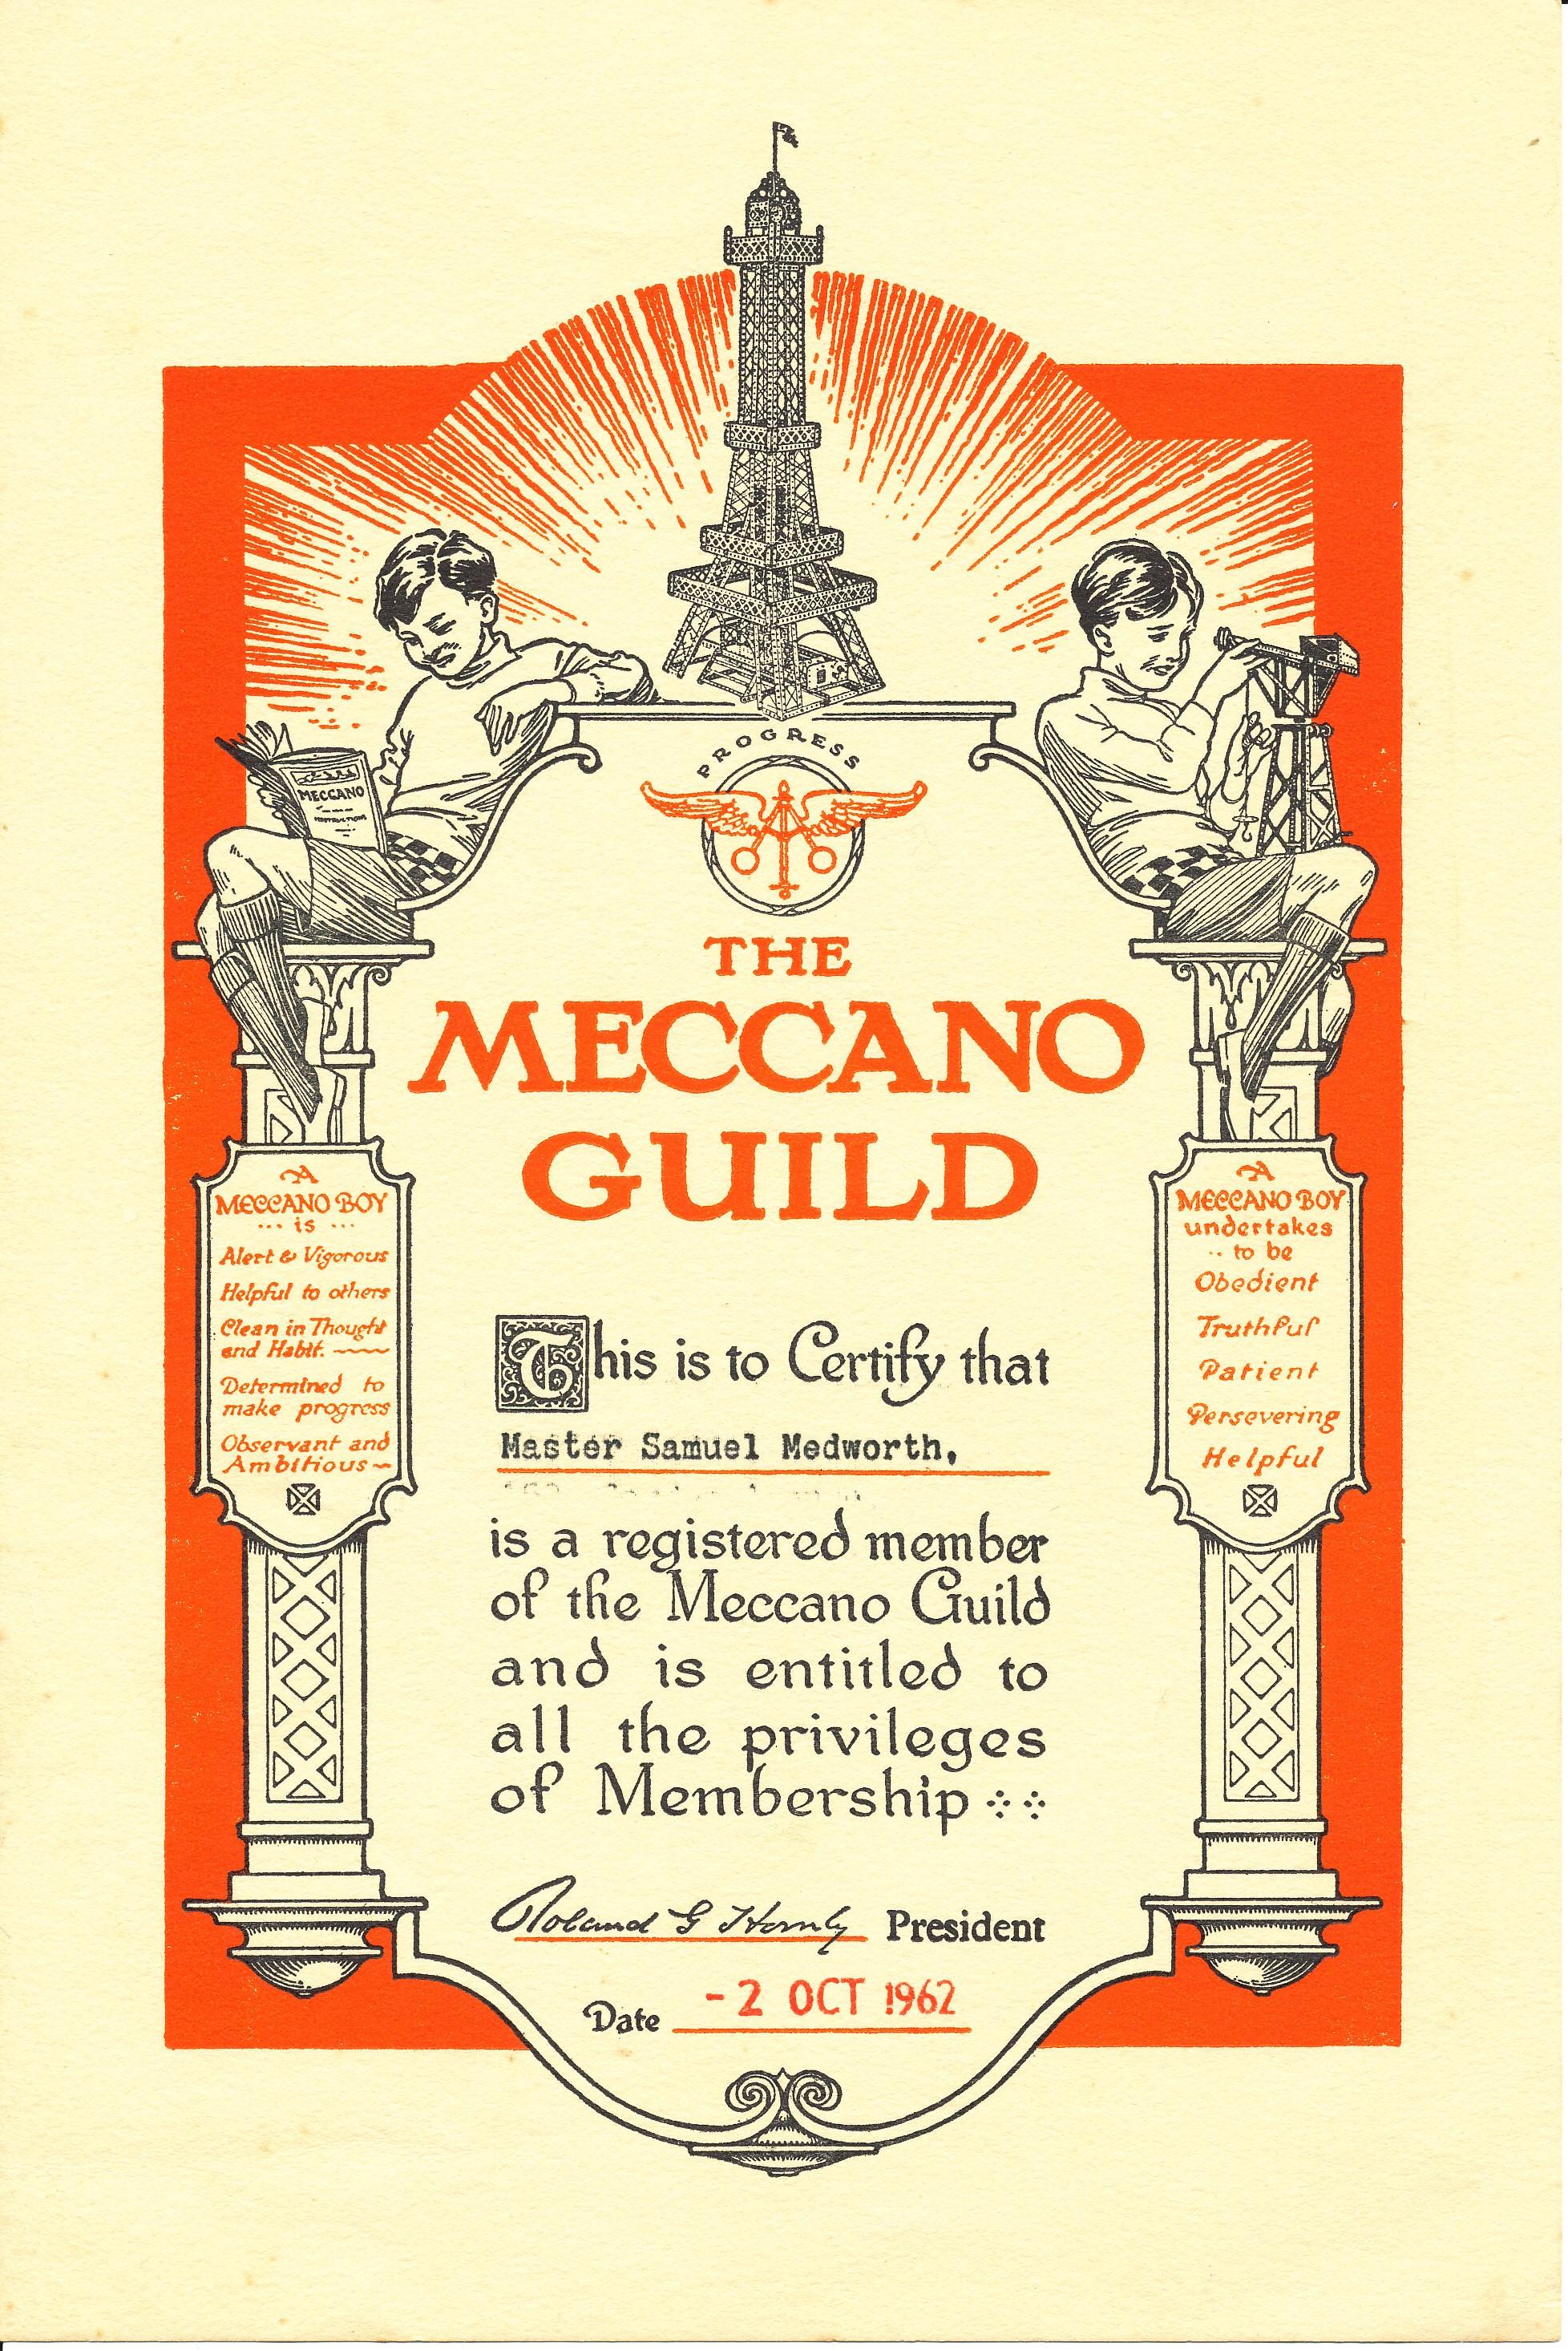 Sam certificate Meccano Guild